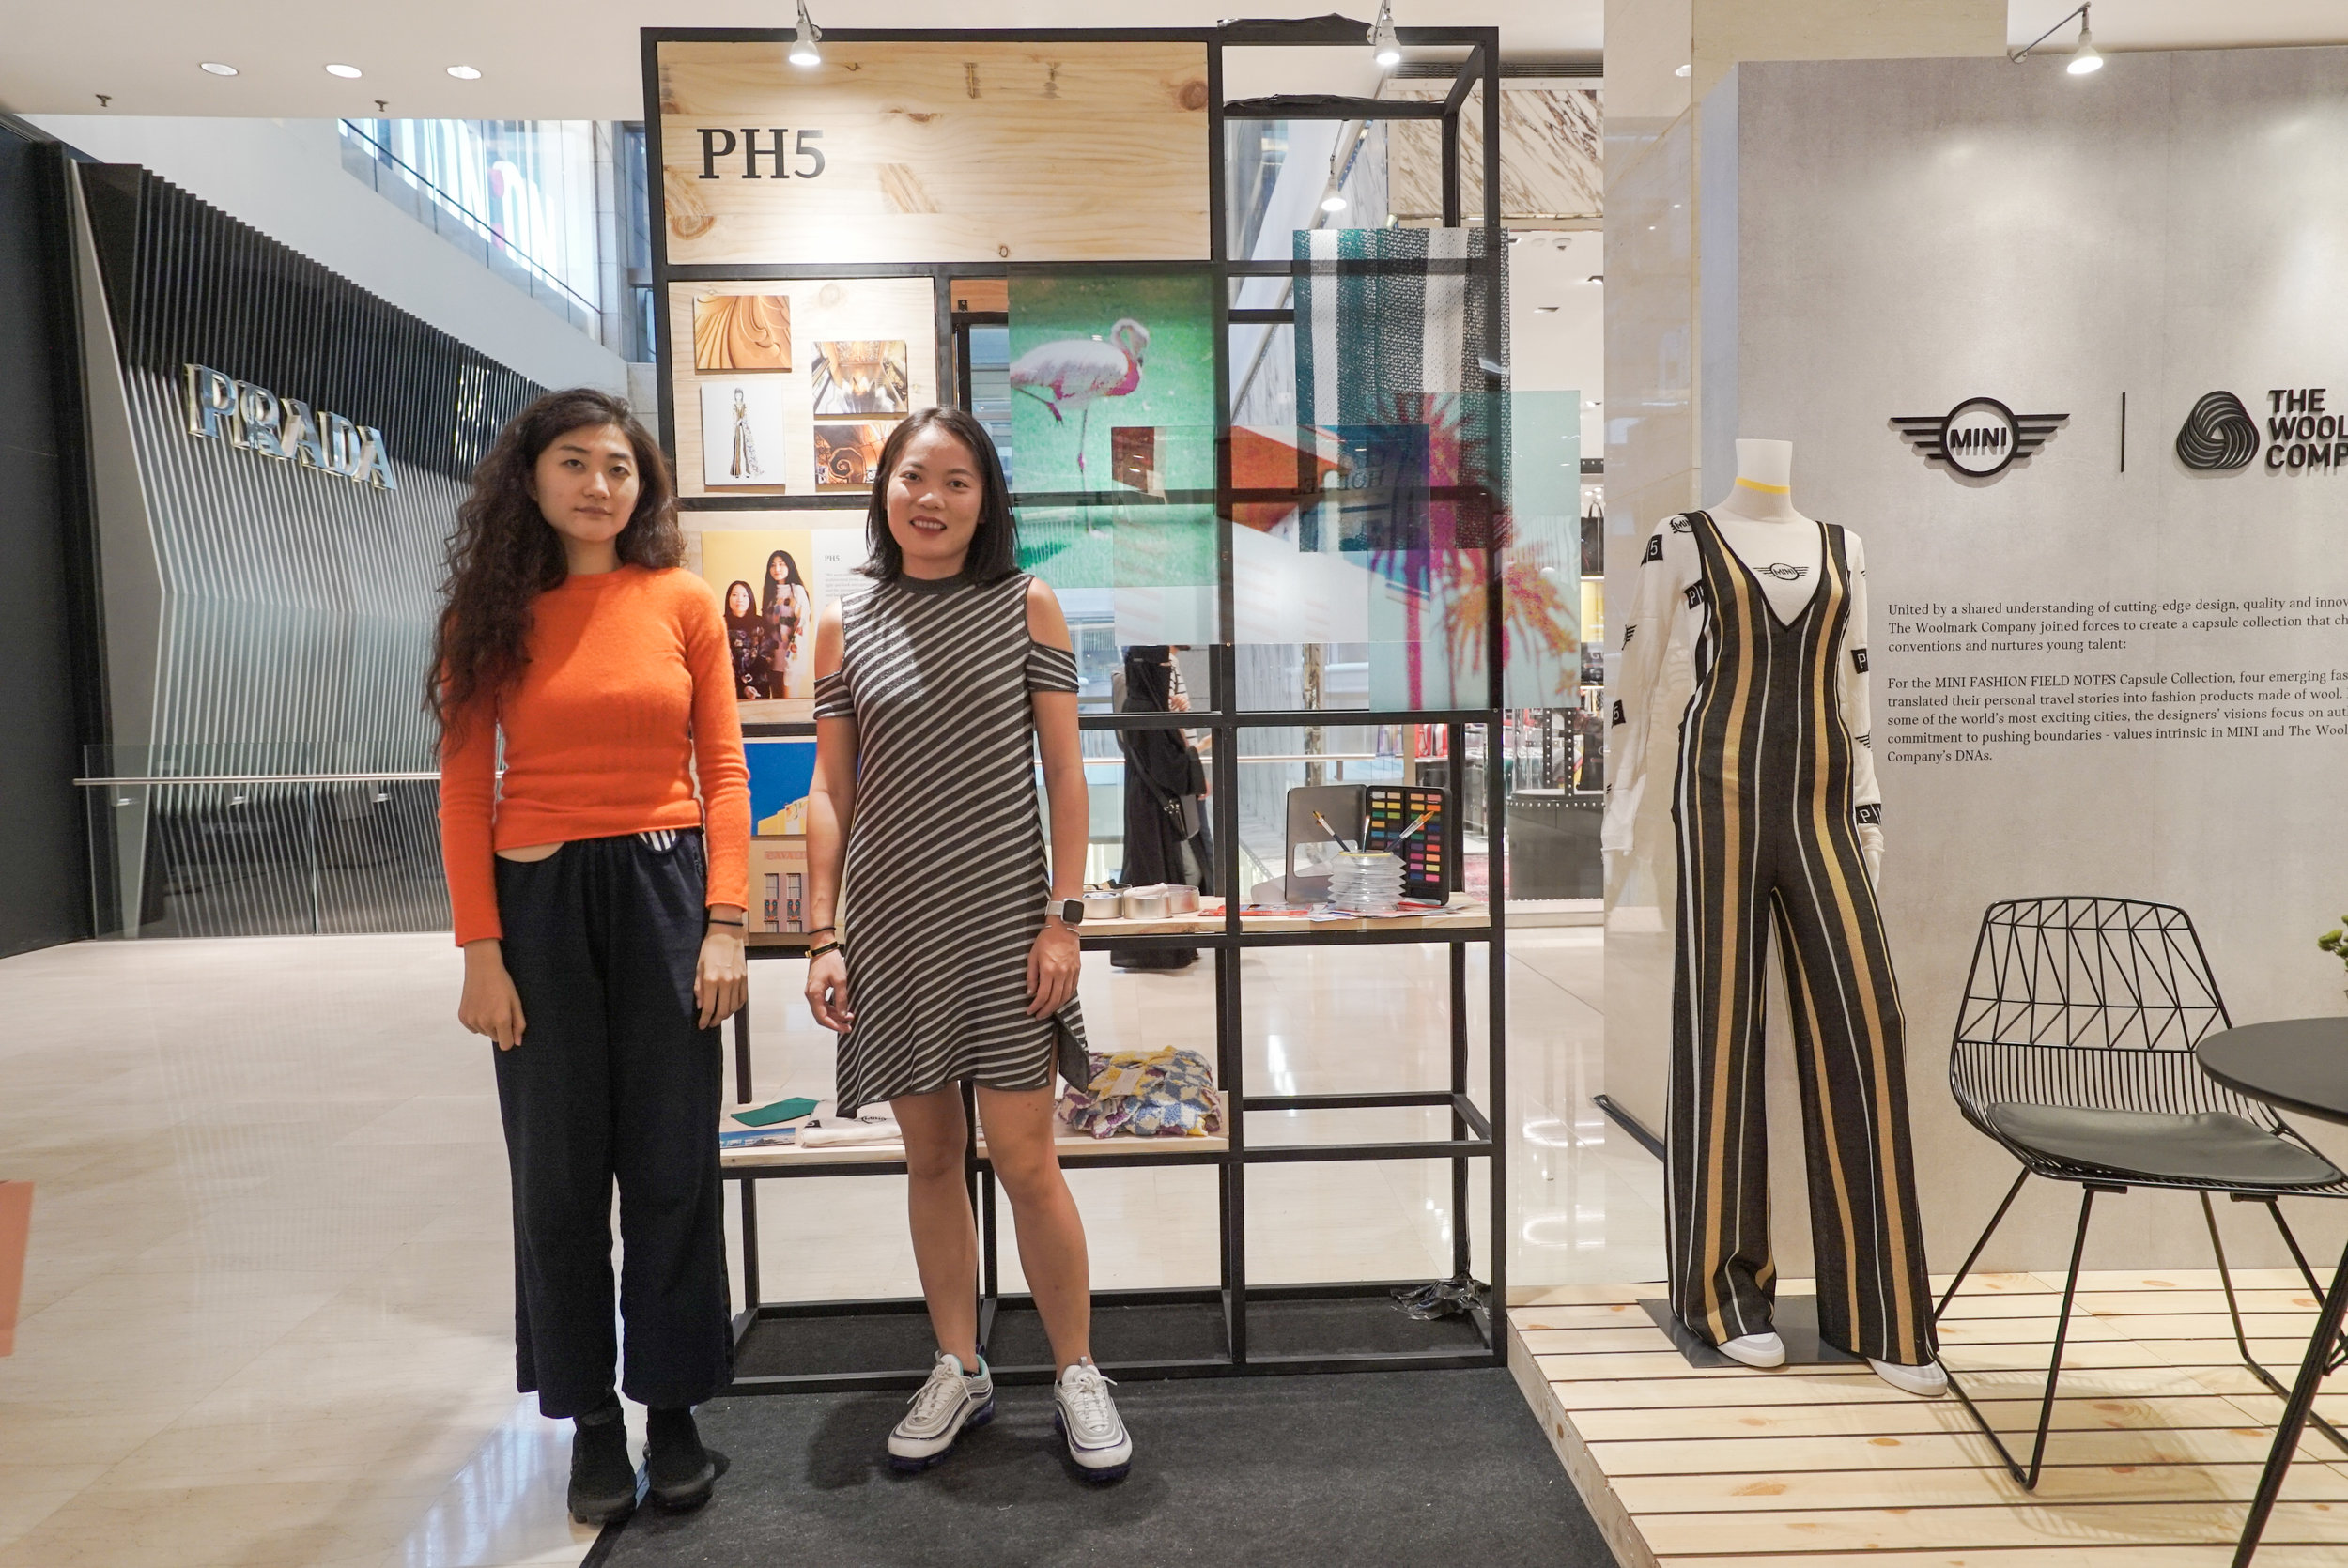 Mijia Zhangin and Wei Lin of PH5